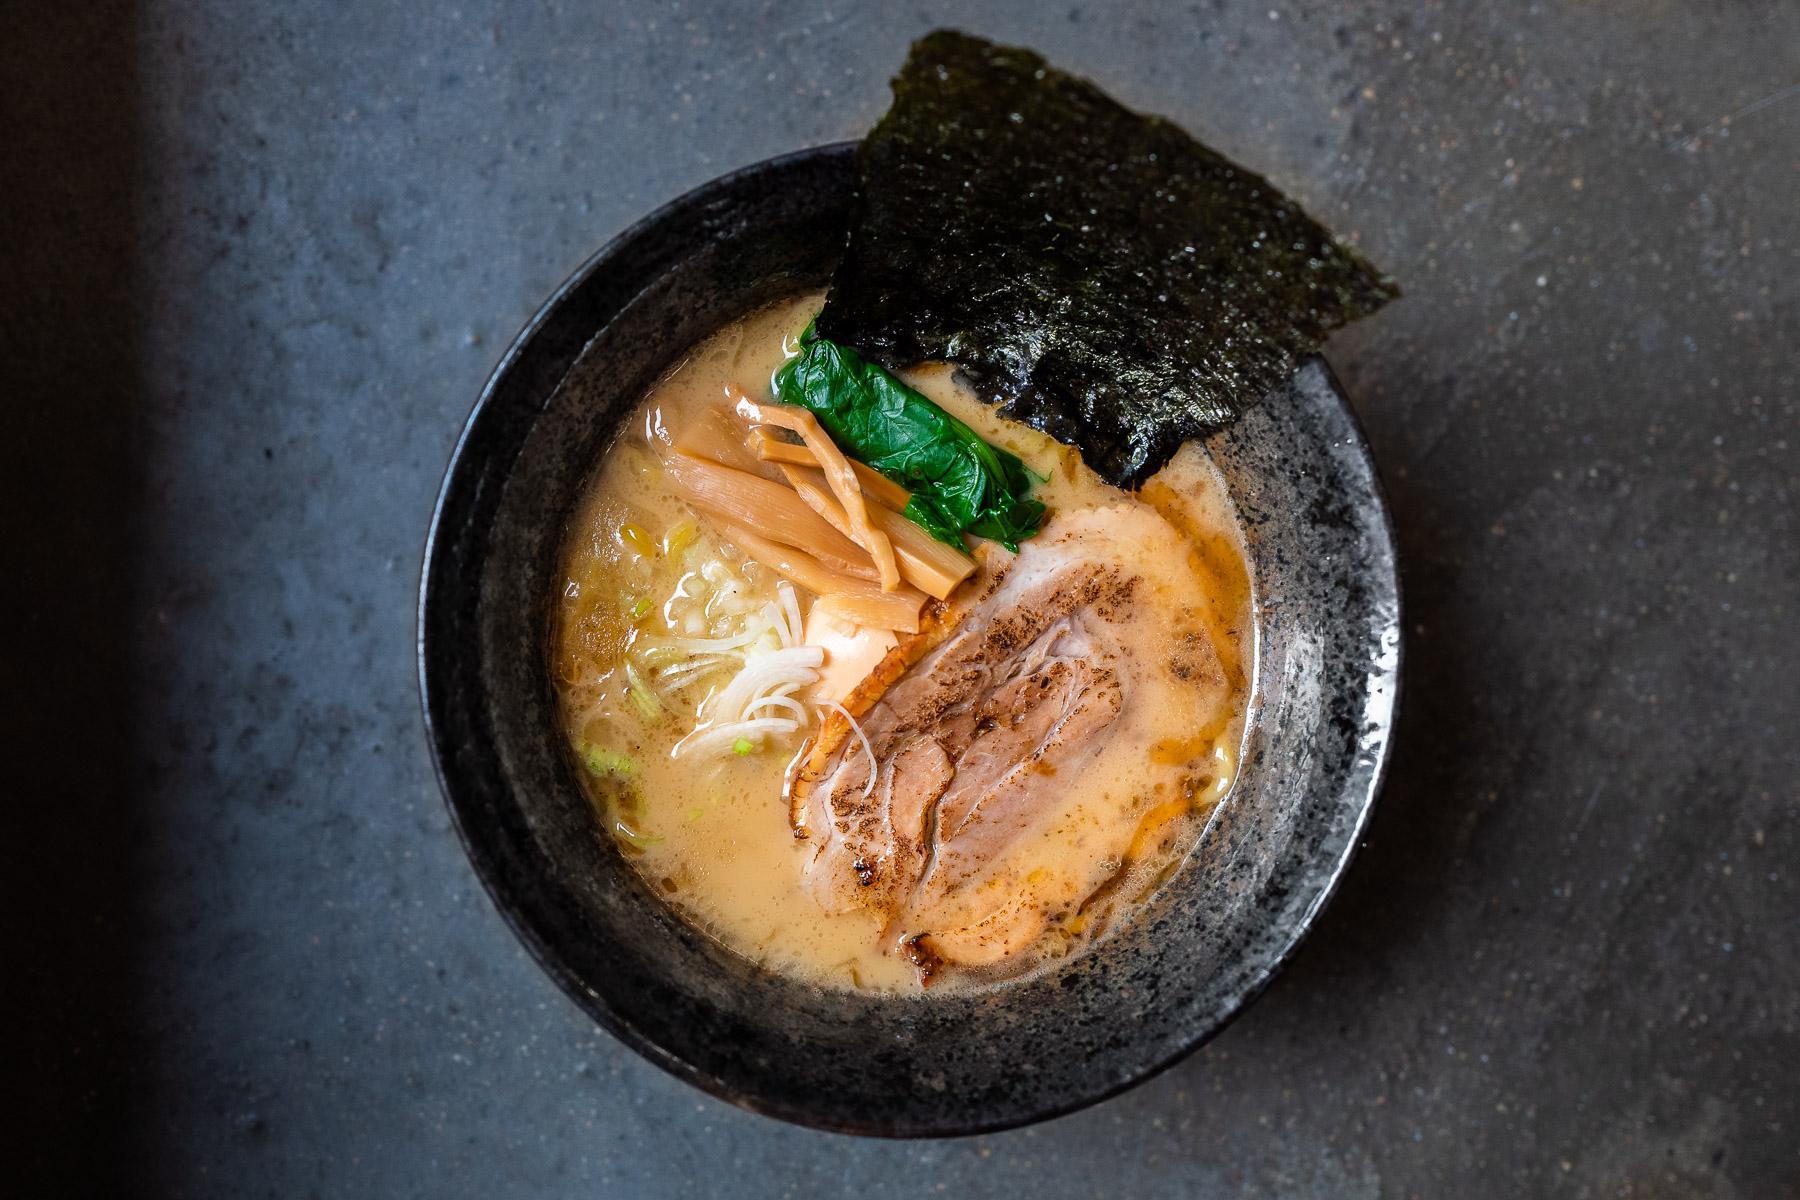 tonkotsu yokohama style ramen